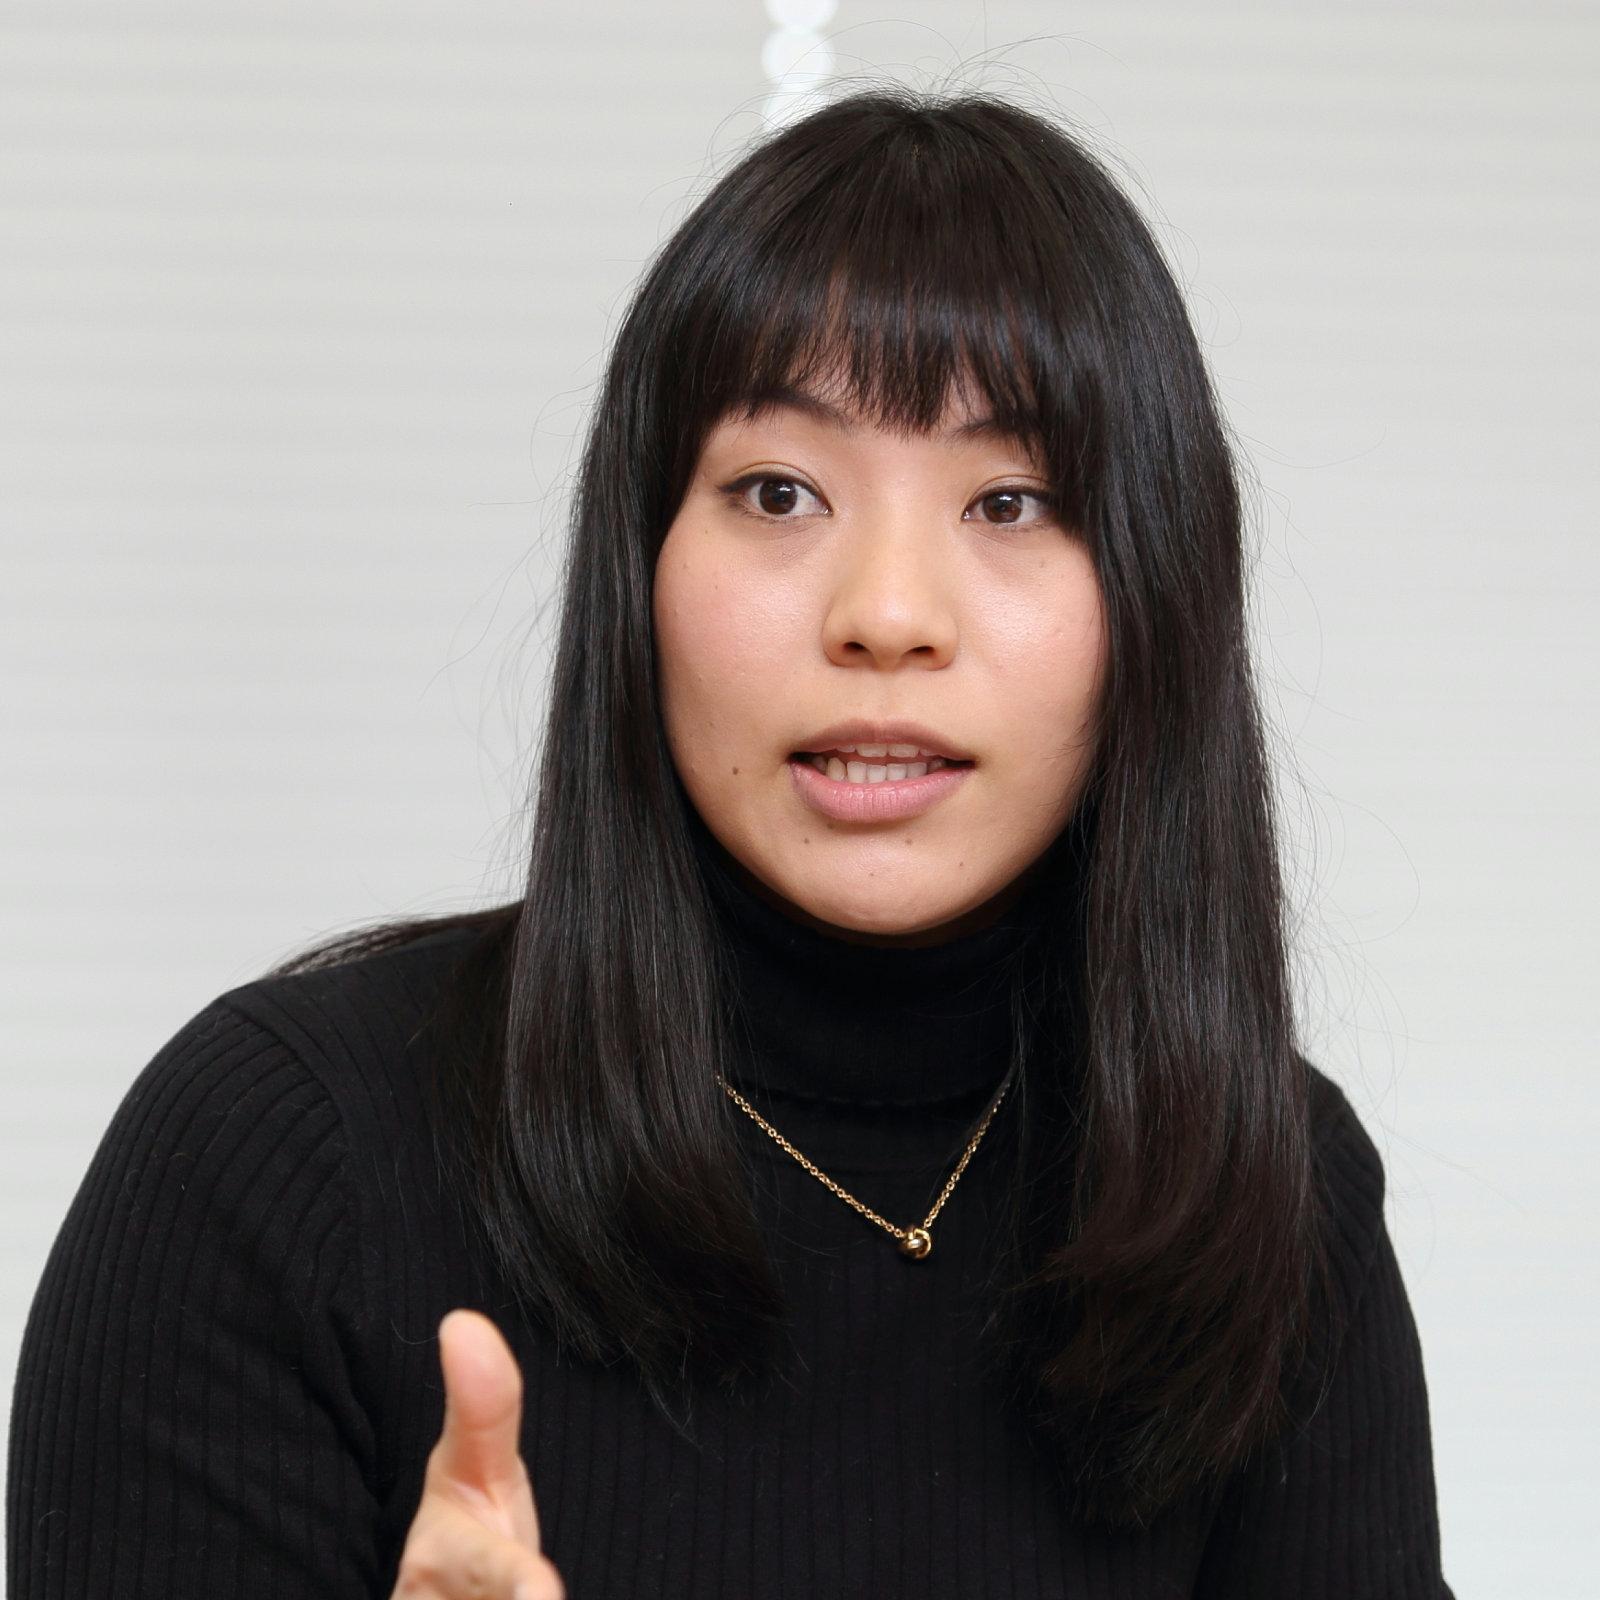 杉野明子の顔写真